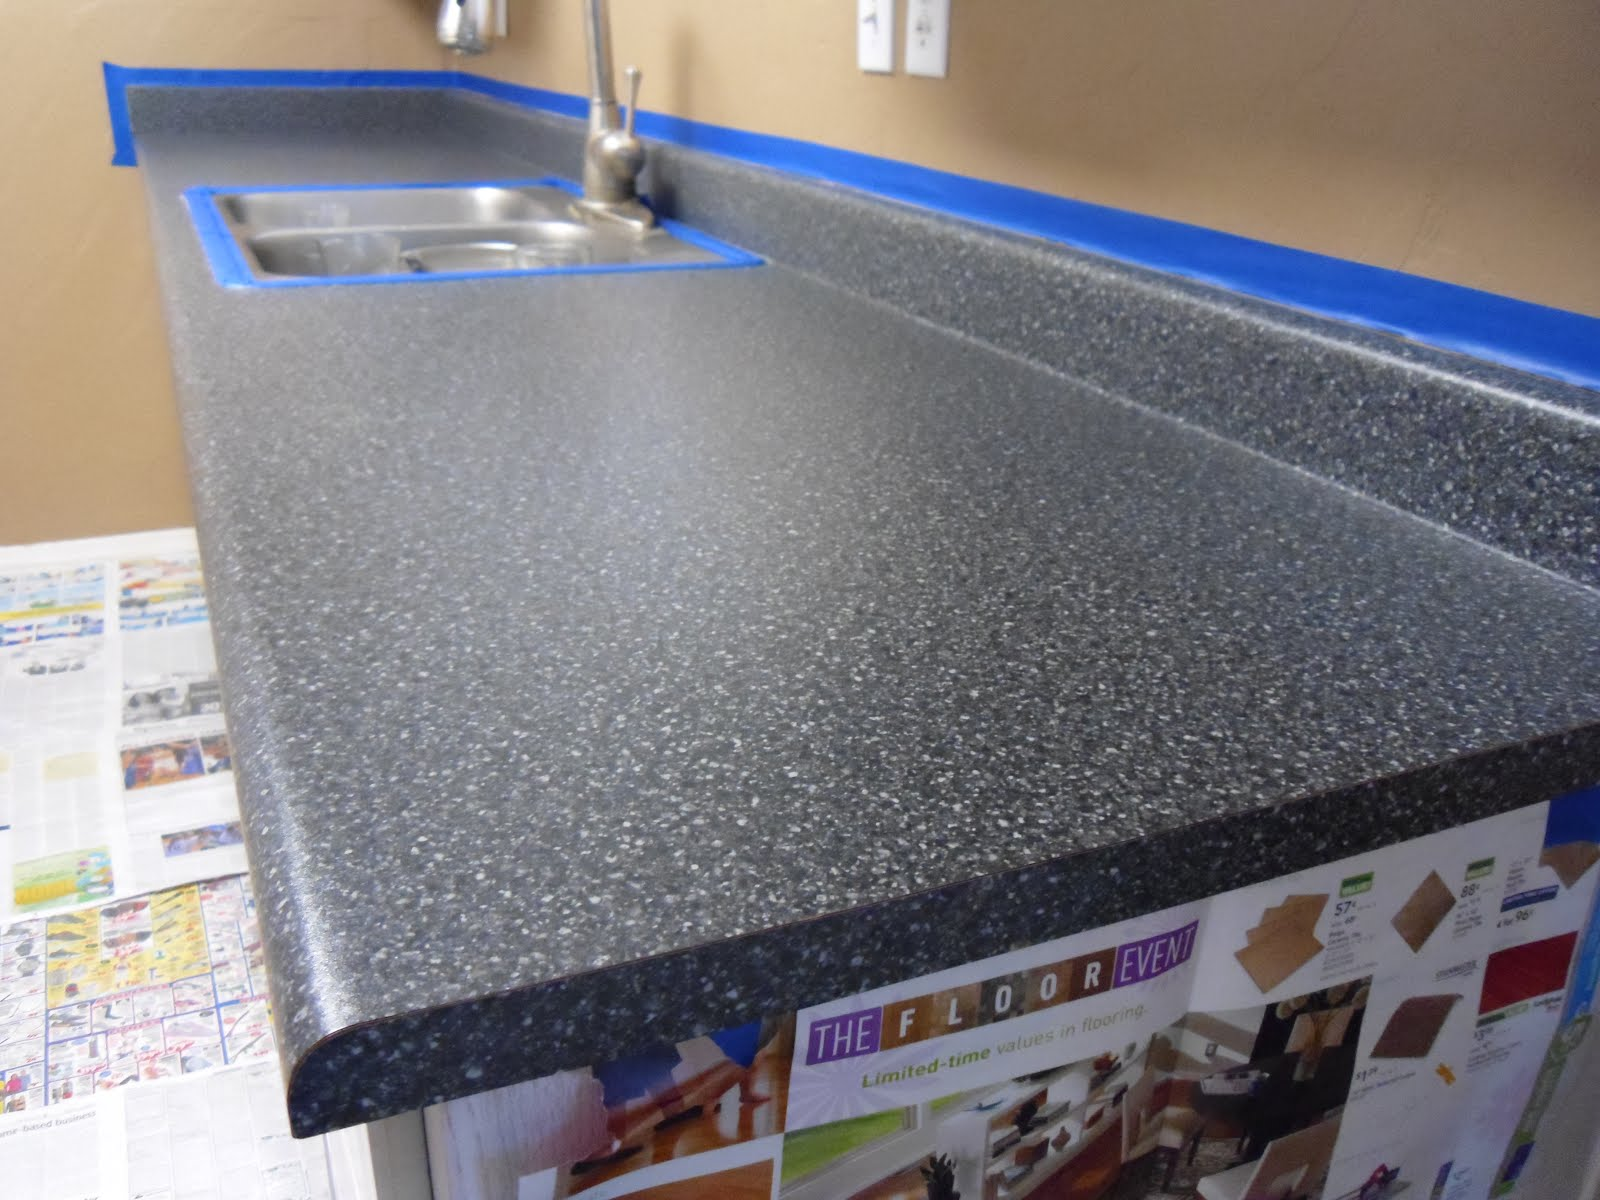 home depot countertop sale kitchen countertops home depot Faux Granite Countertops Home Depot